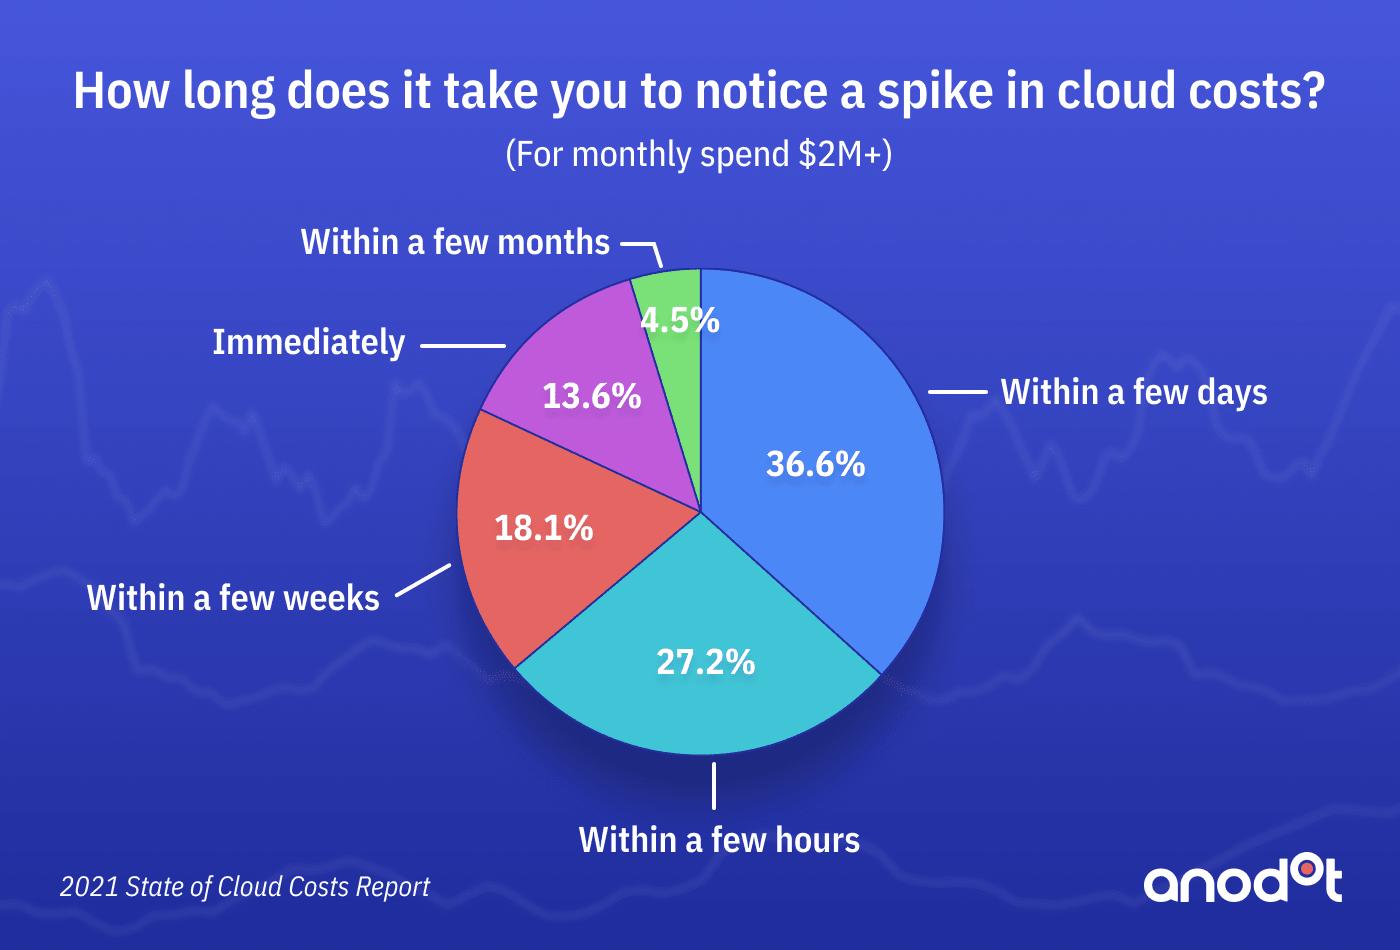 Cloud Anodot